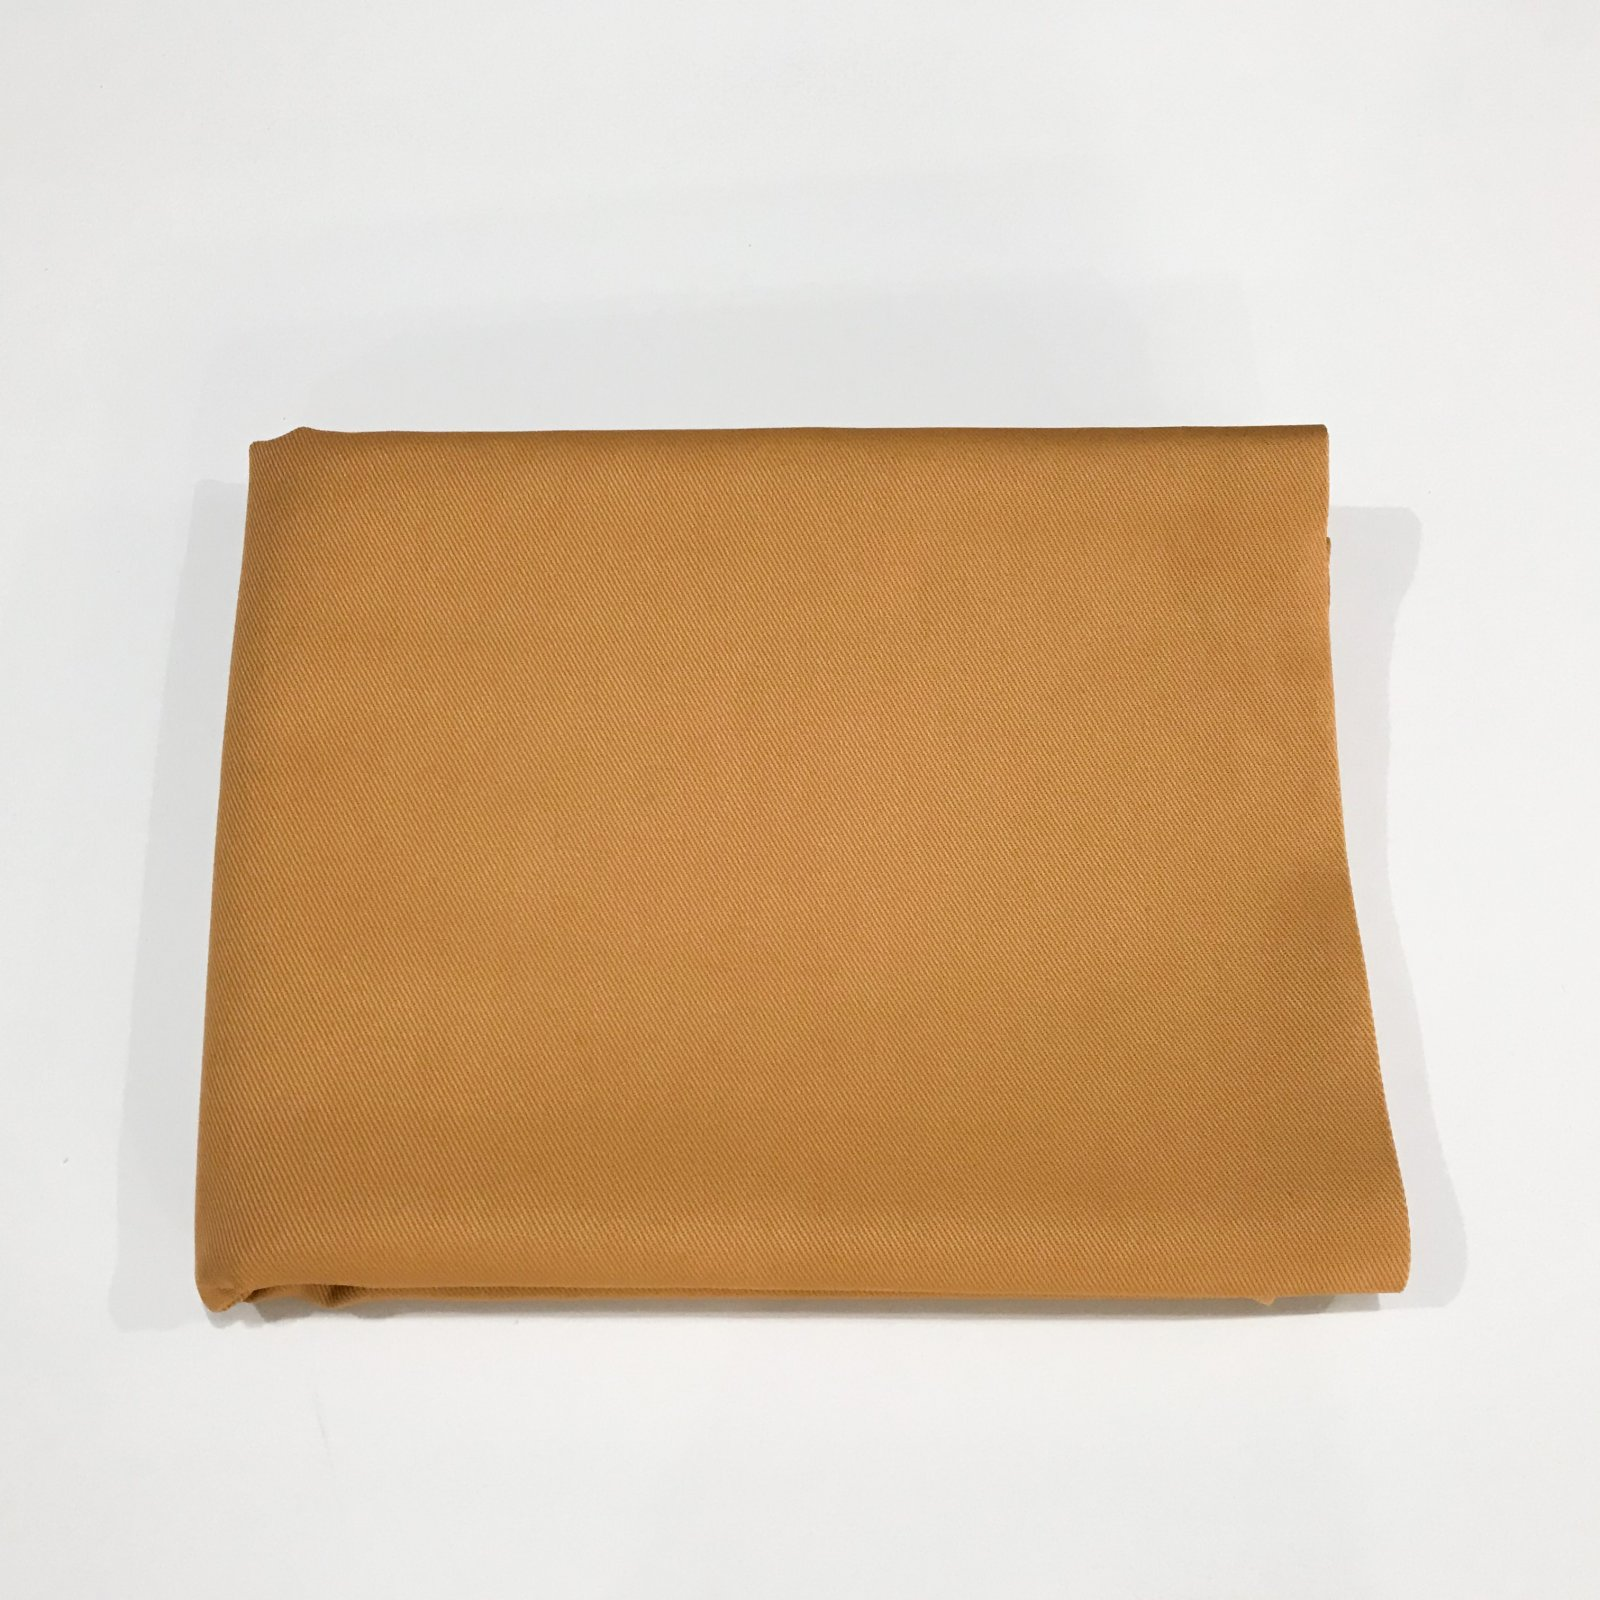 1 yard - 32 inches - Ventana Twill - Soft Mustard